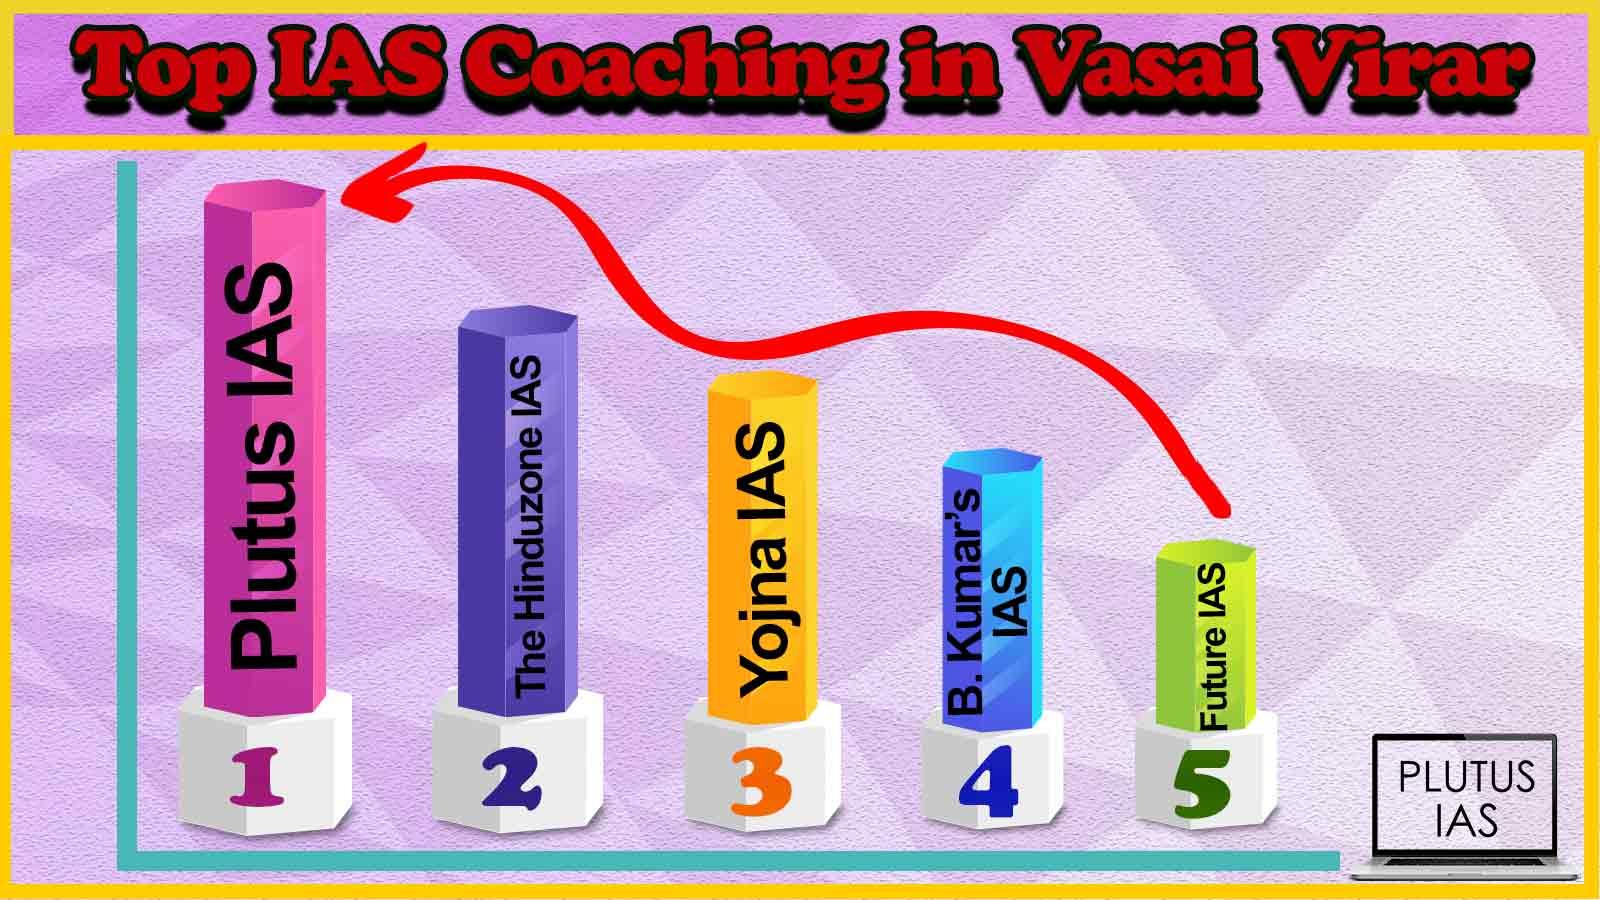 Best 10 IAS Coaching in Vasai Virar